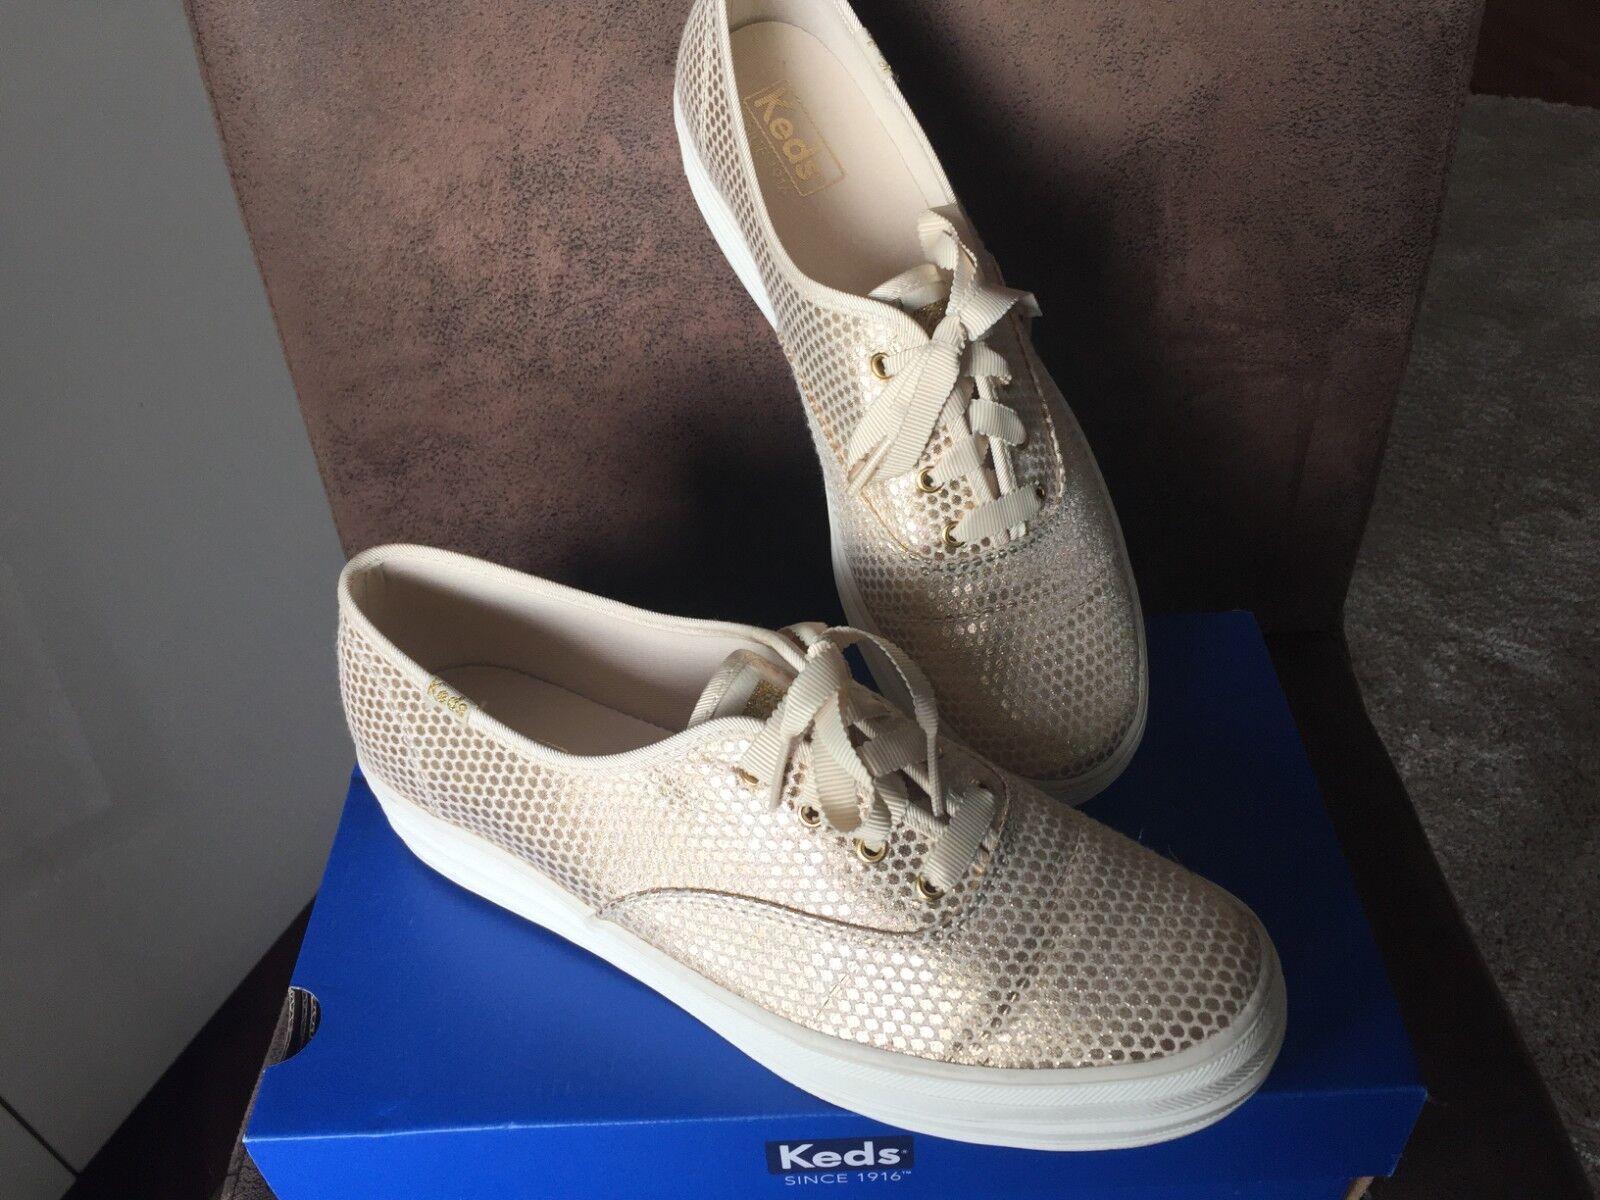 Keds neu Triple Shimmer goldene Sneakers neu Keds WF55760 Gr. 41 633cfc